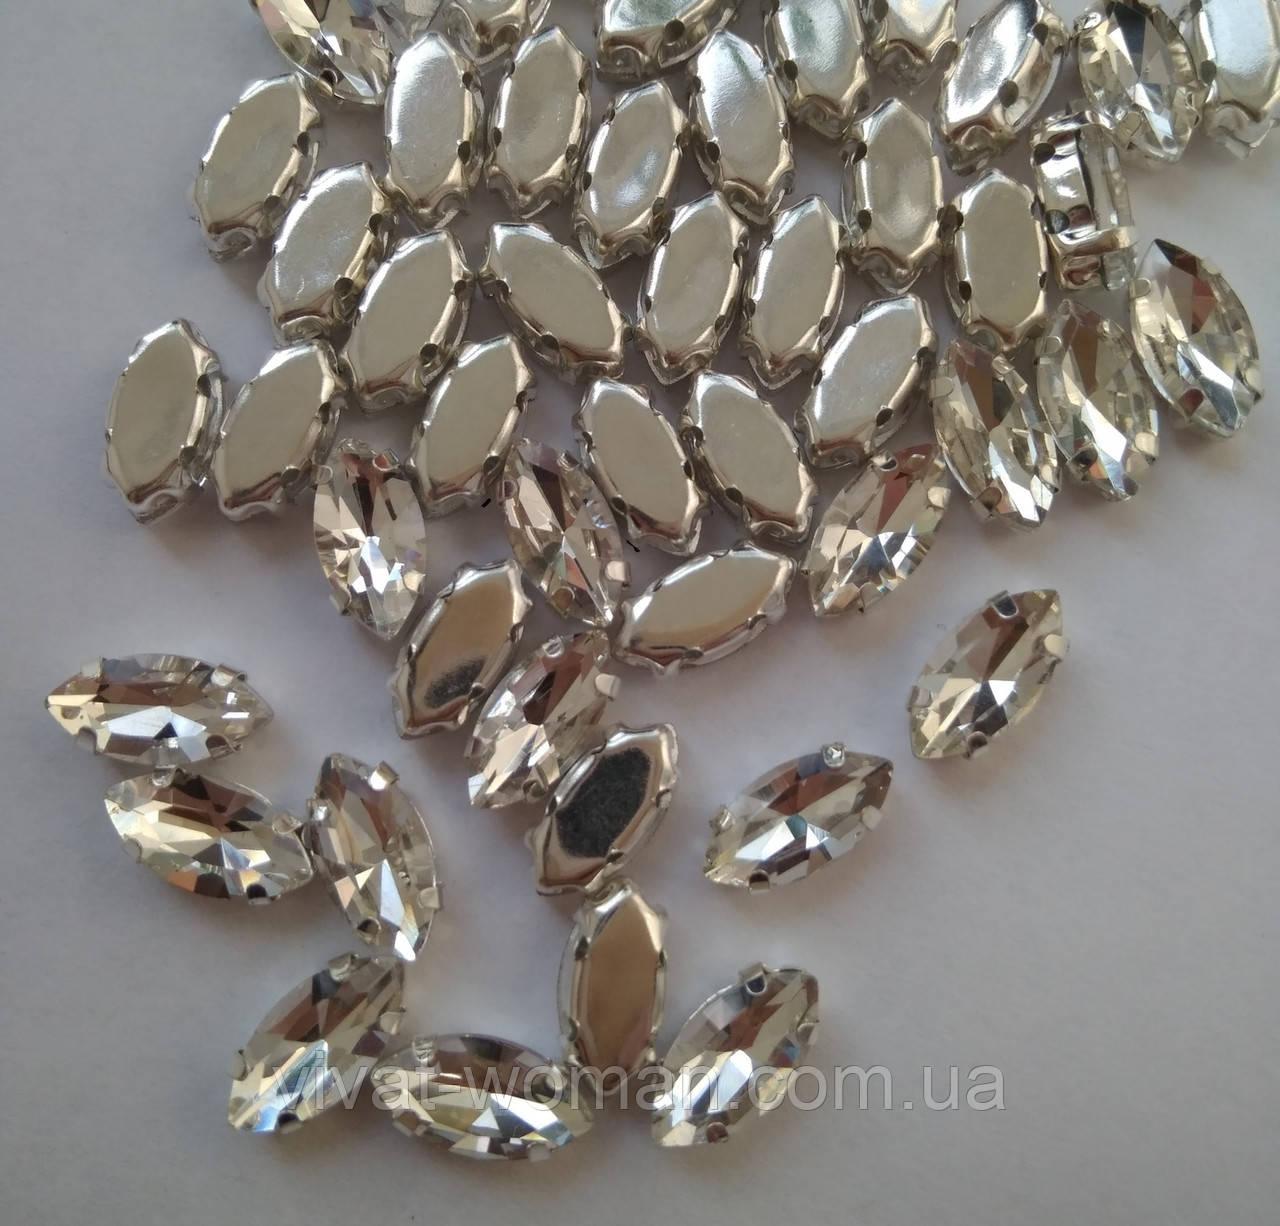 Стрази в цапах, Лодочка 7х15 мм, Crystal, скло, срібна оправа. Ціна за 1 шт